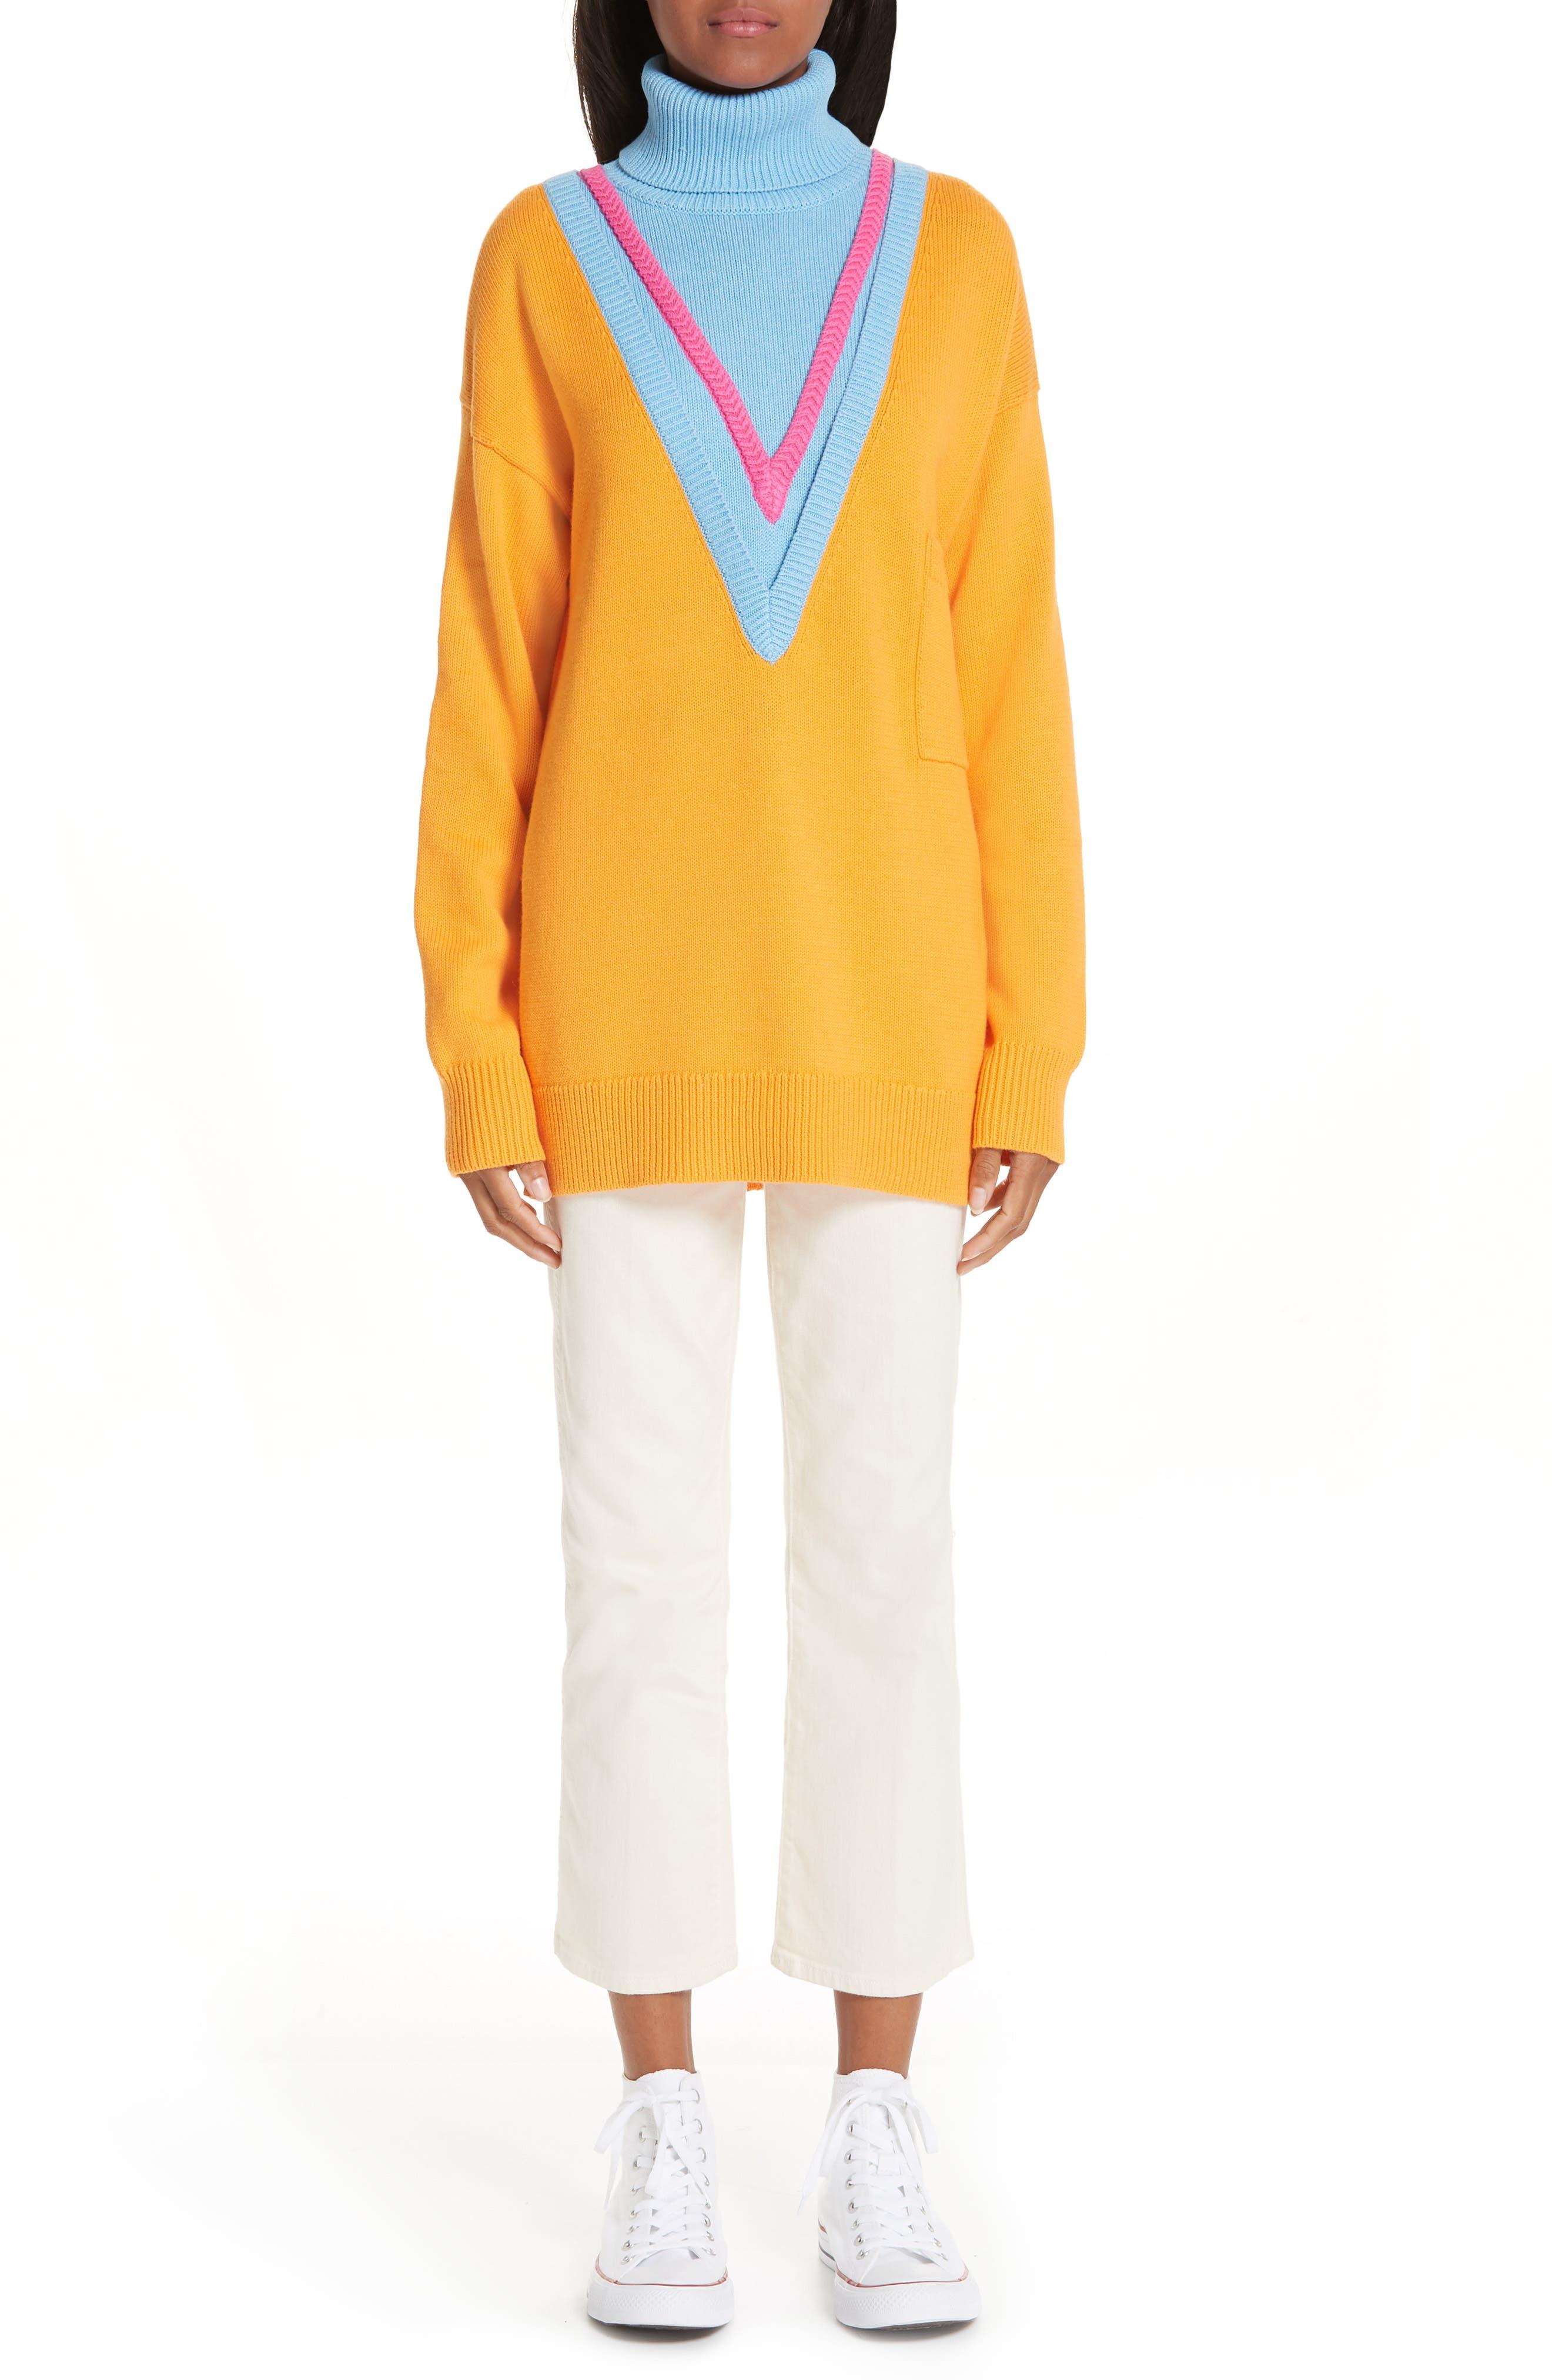 VICTOR GLEMAUD,                             Layered Cotton & Cashmere Turtleneck Sweater,                             Alternate thumbnail 7, color,                             ORANGE COMBO